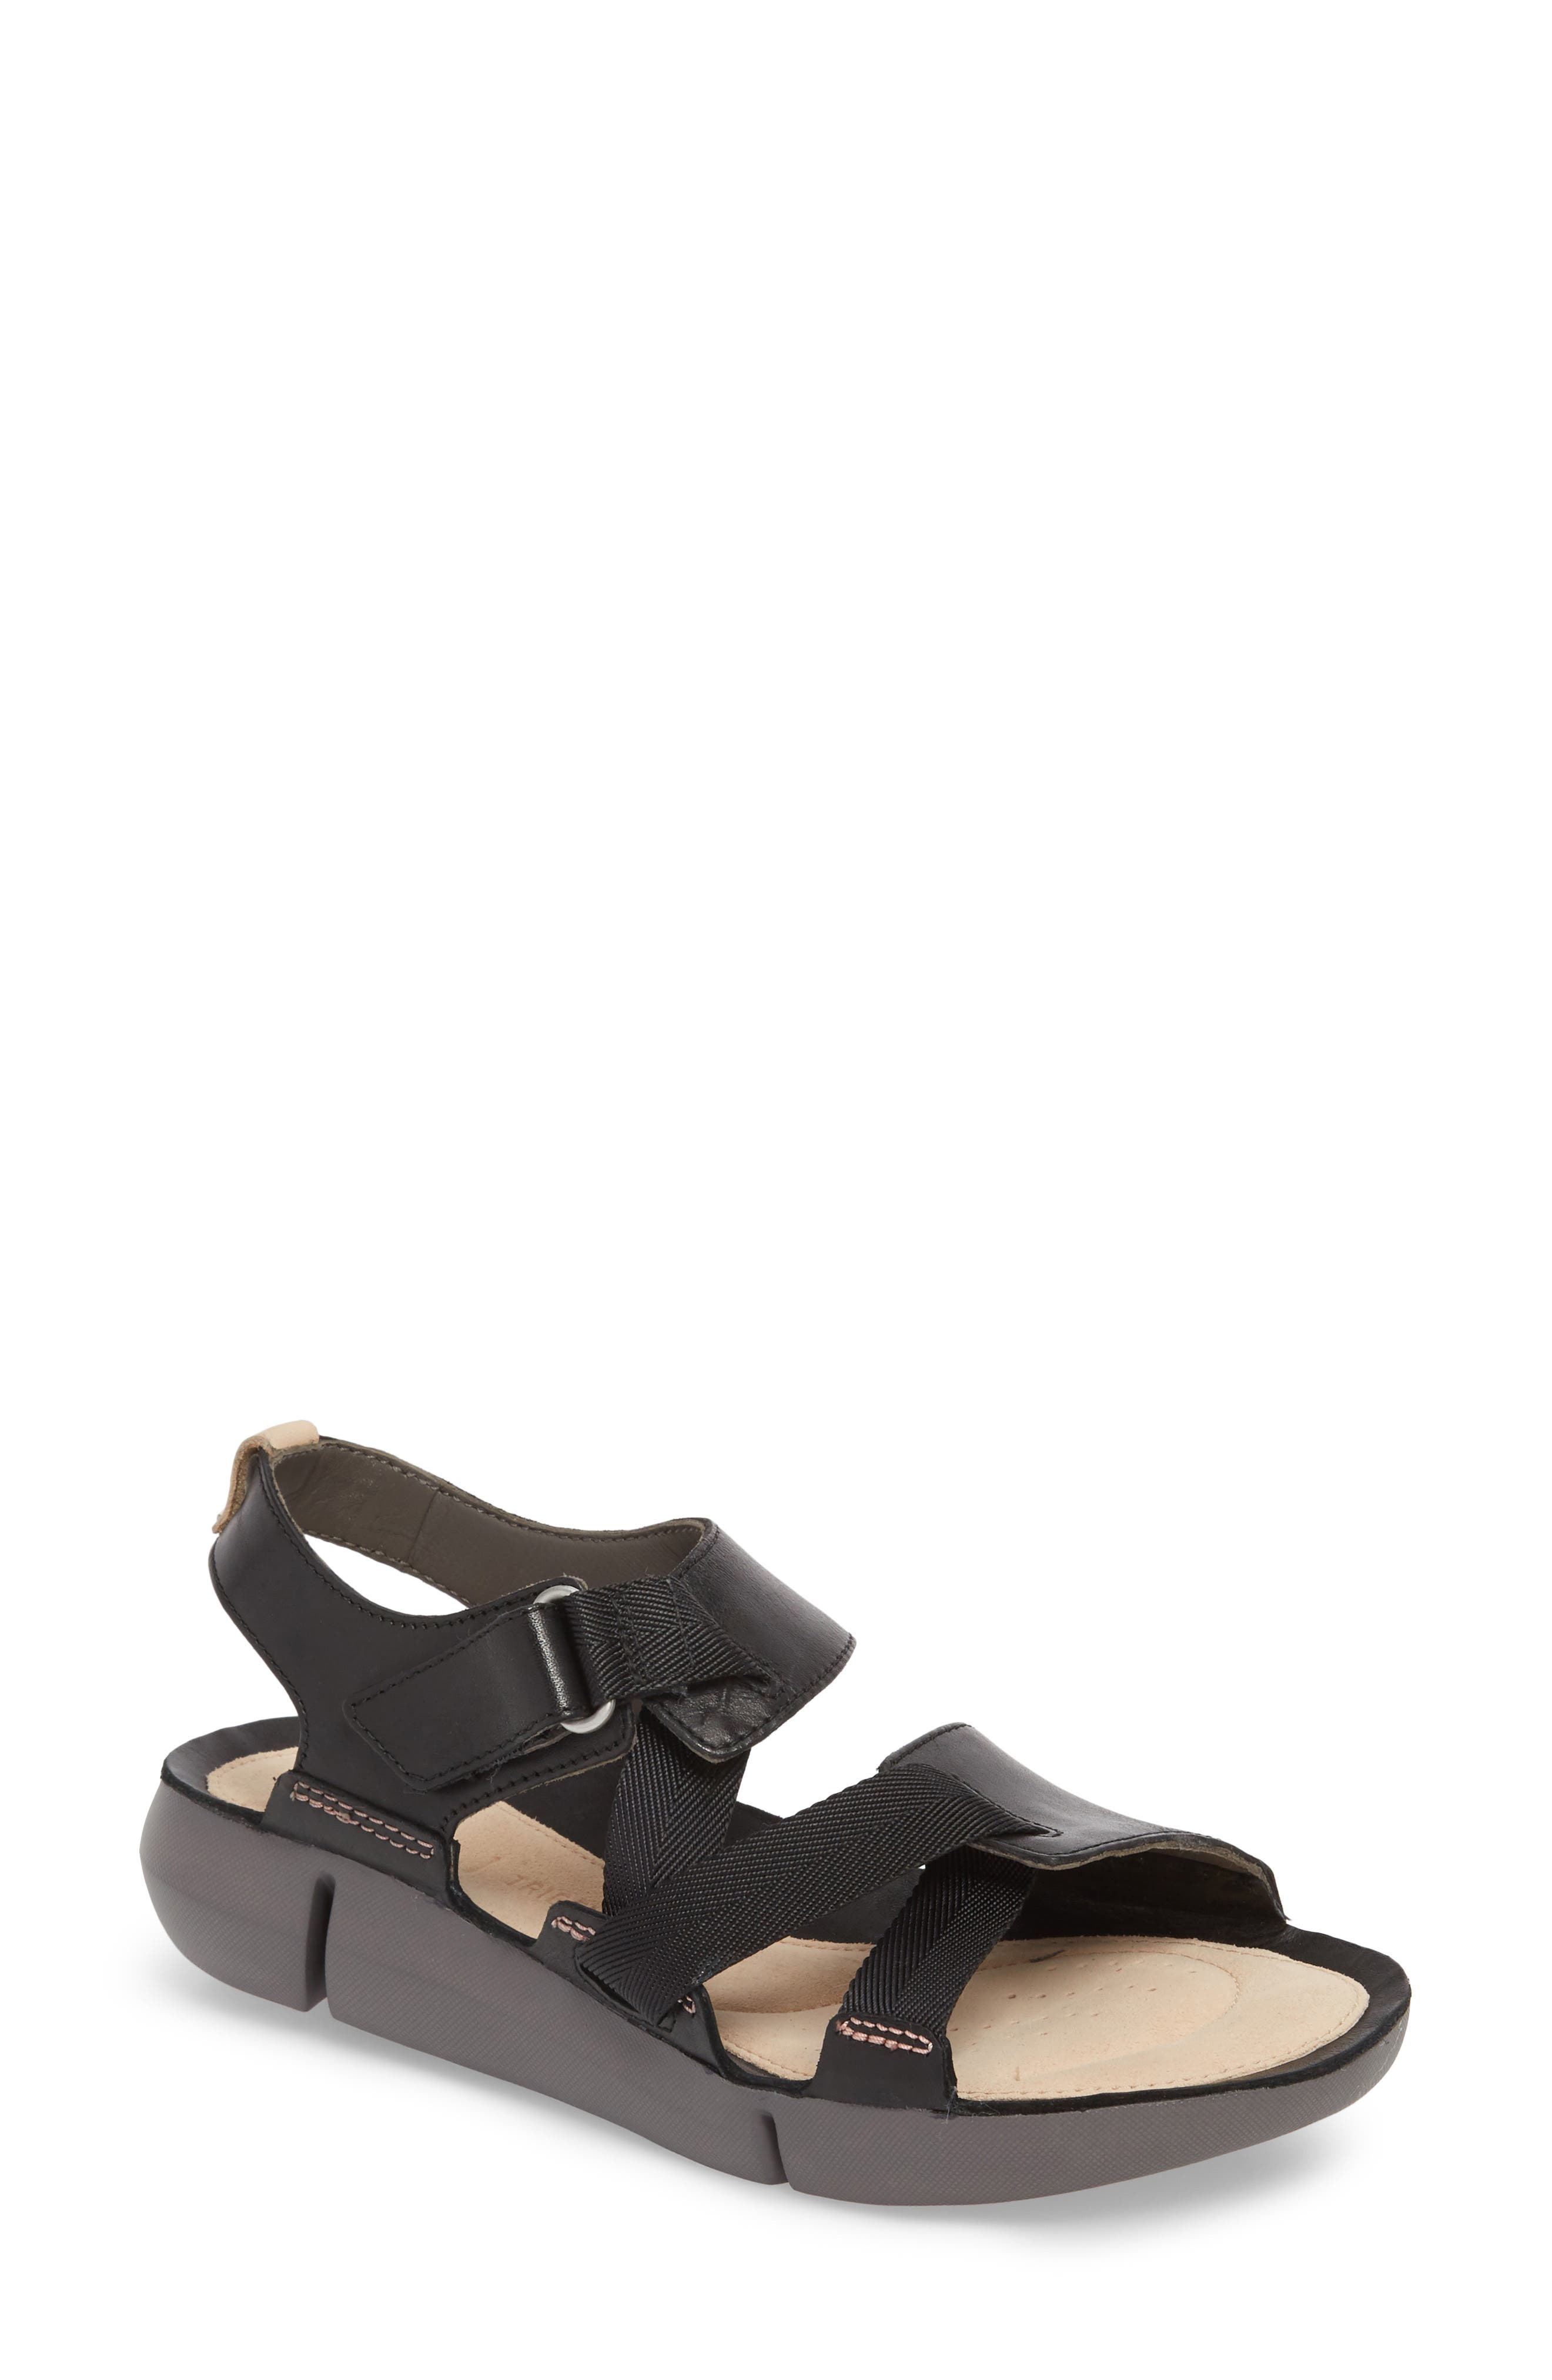 Tri Clover Sandal,                         Main,                         color, 019